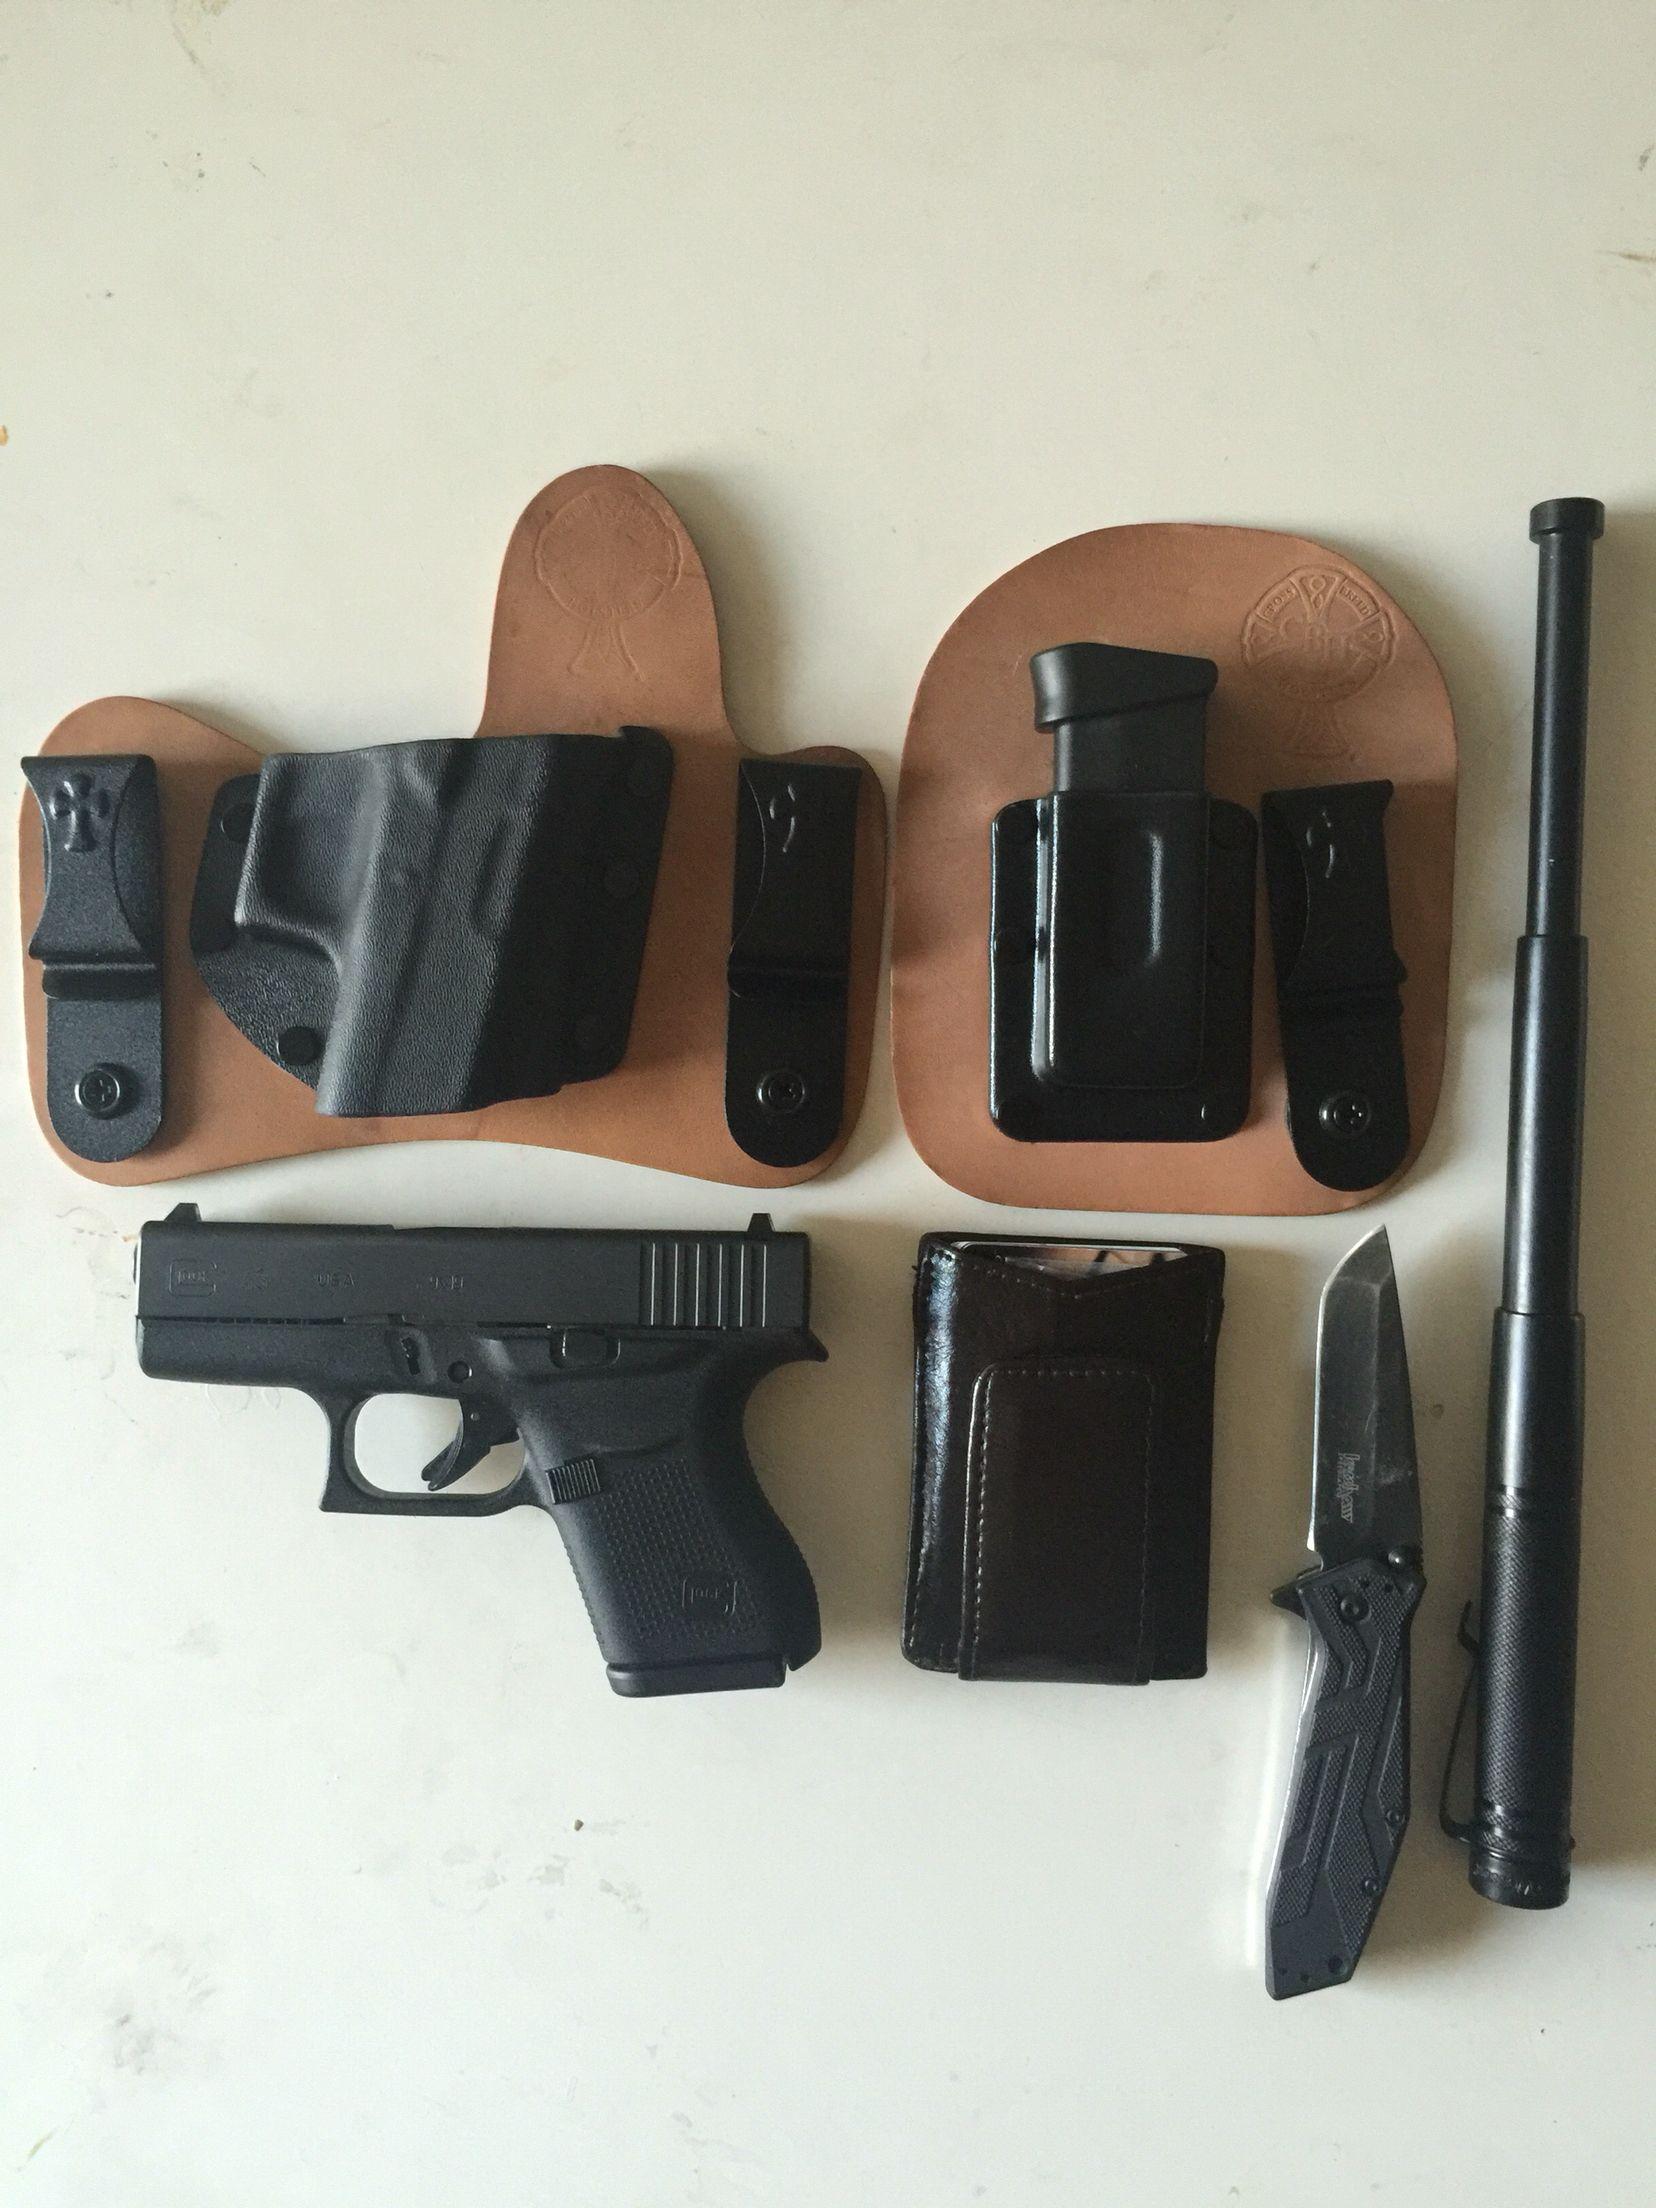 My EDC setup  Glock 43 with a Crossbreed mini tuck